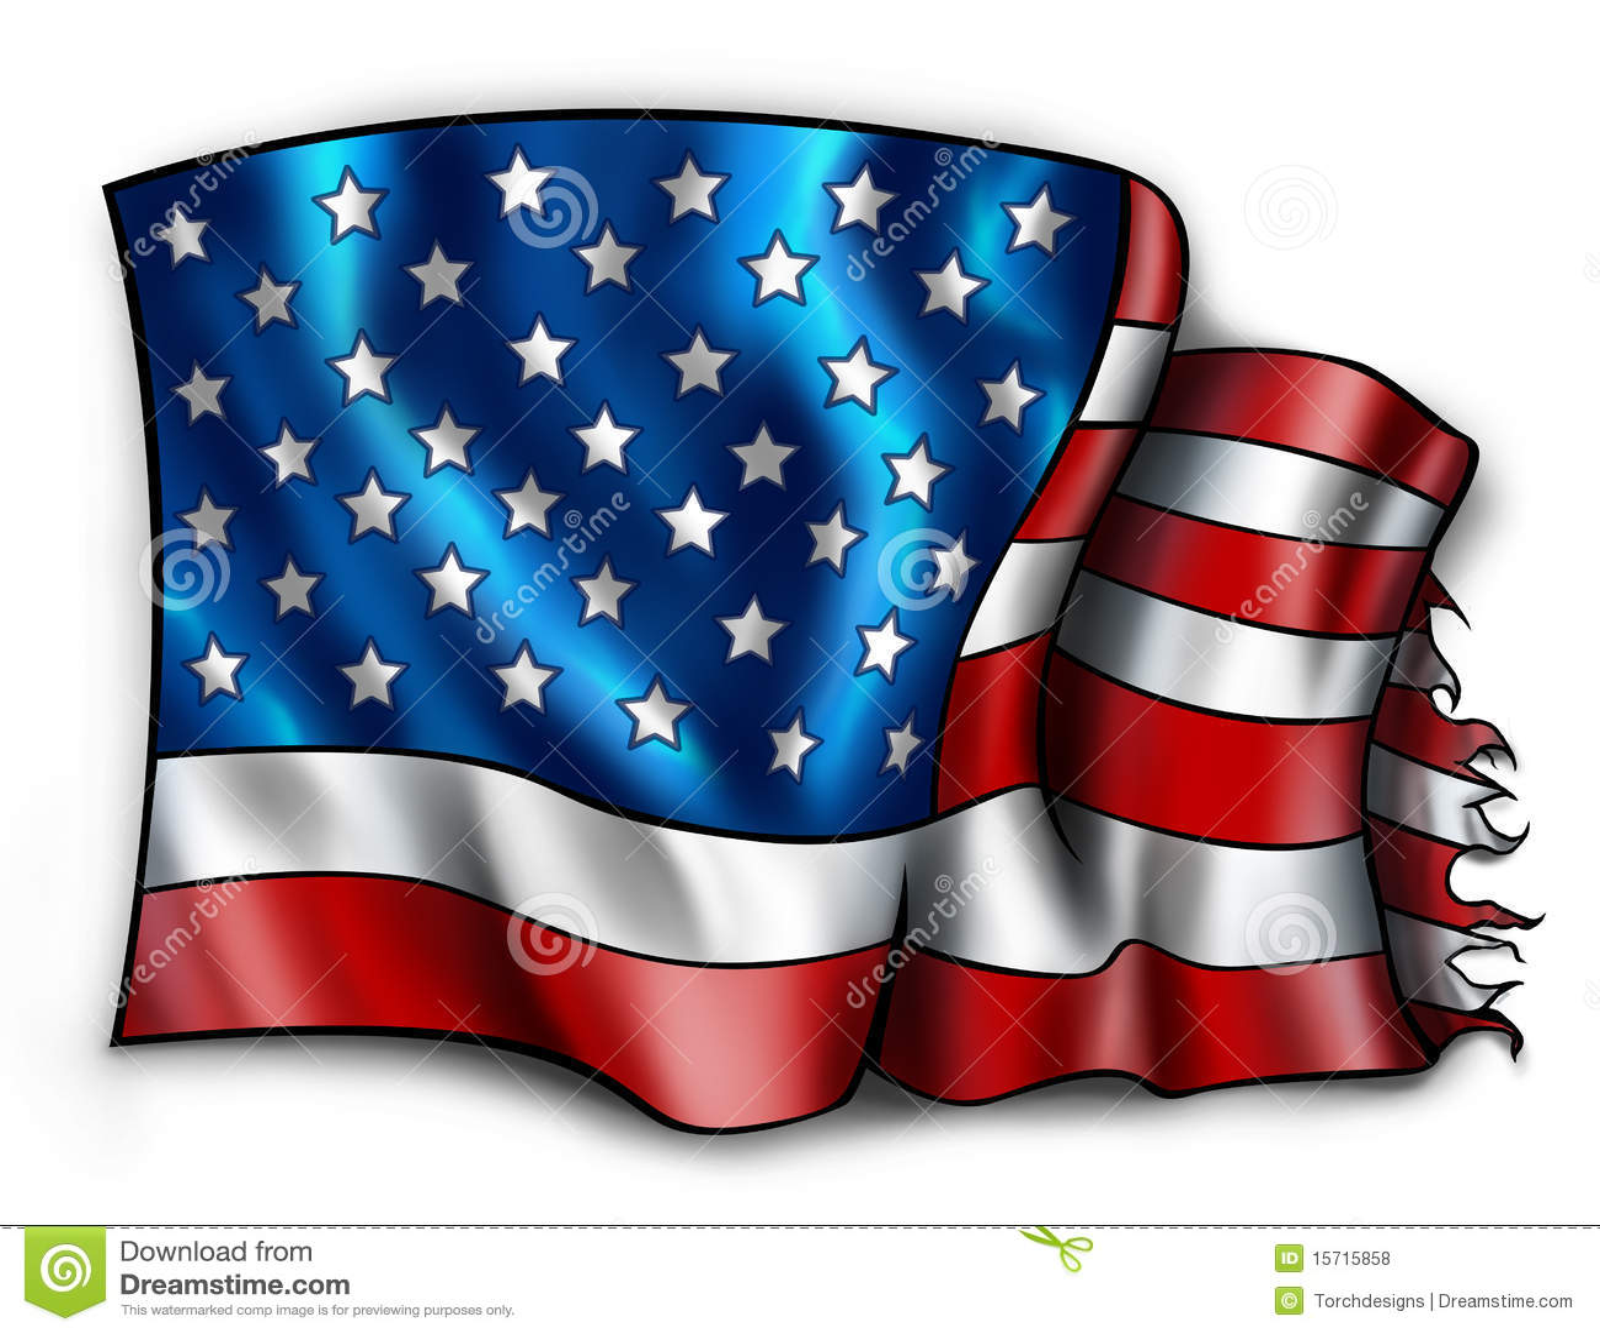 Tattered Amerikanische Flagge Stock Abbildung - Illustration von ...